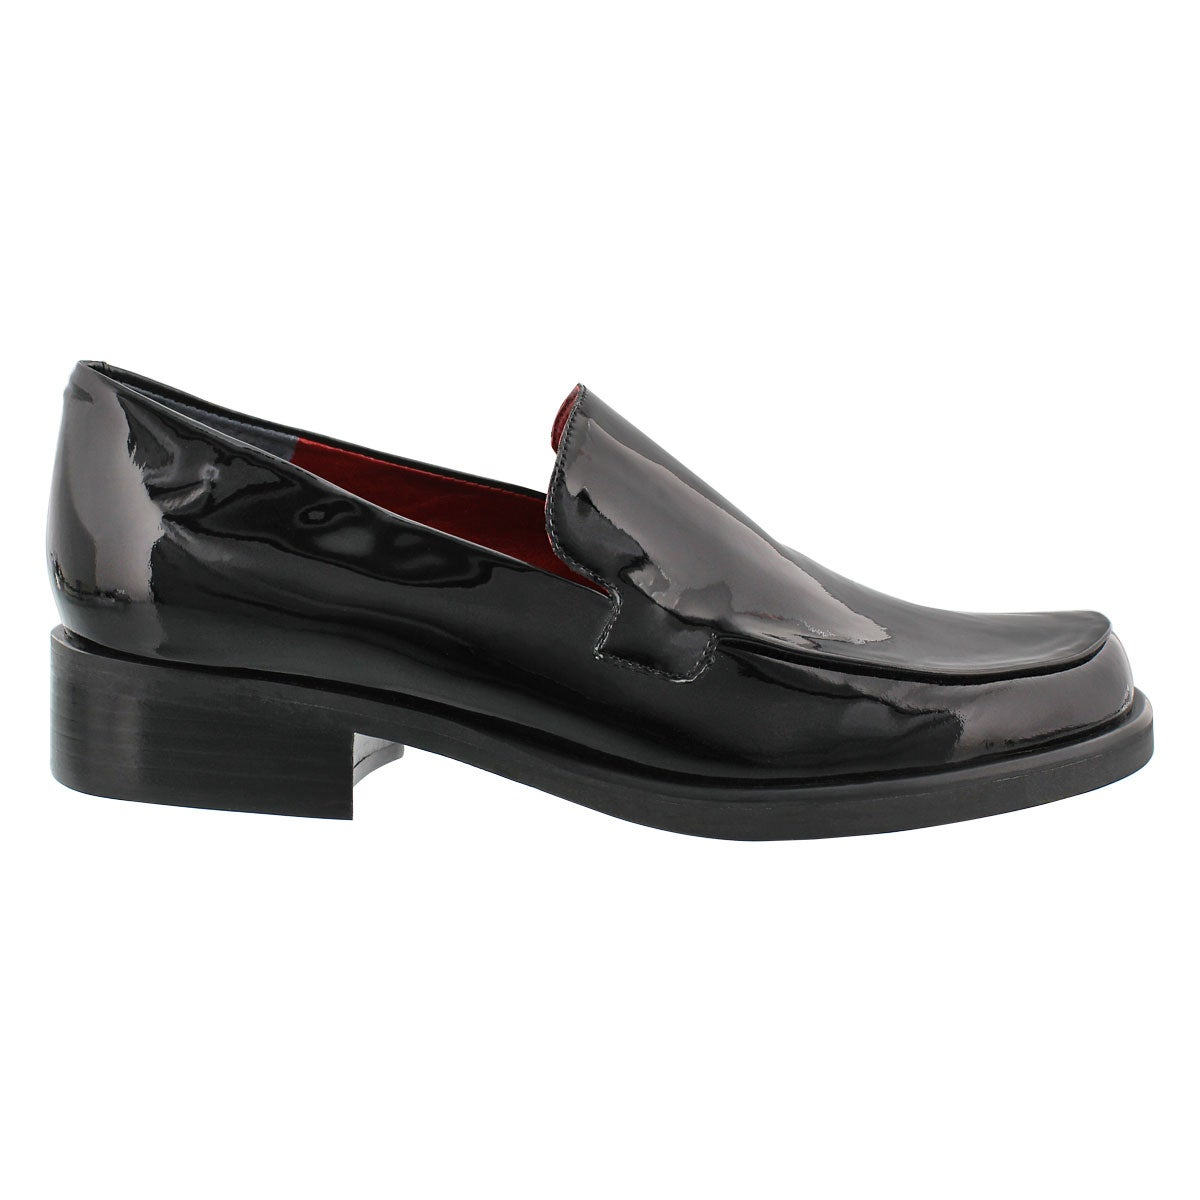 Lds Bocca blk patent slip on loafer